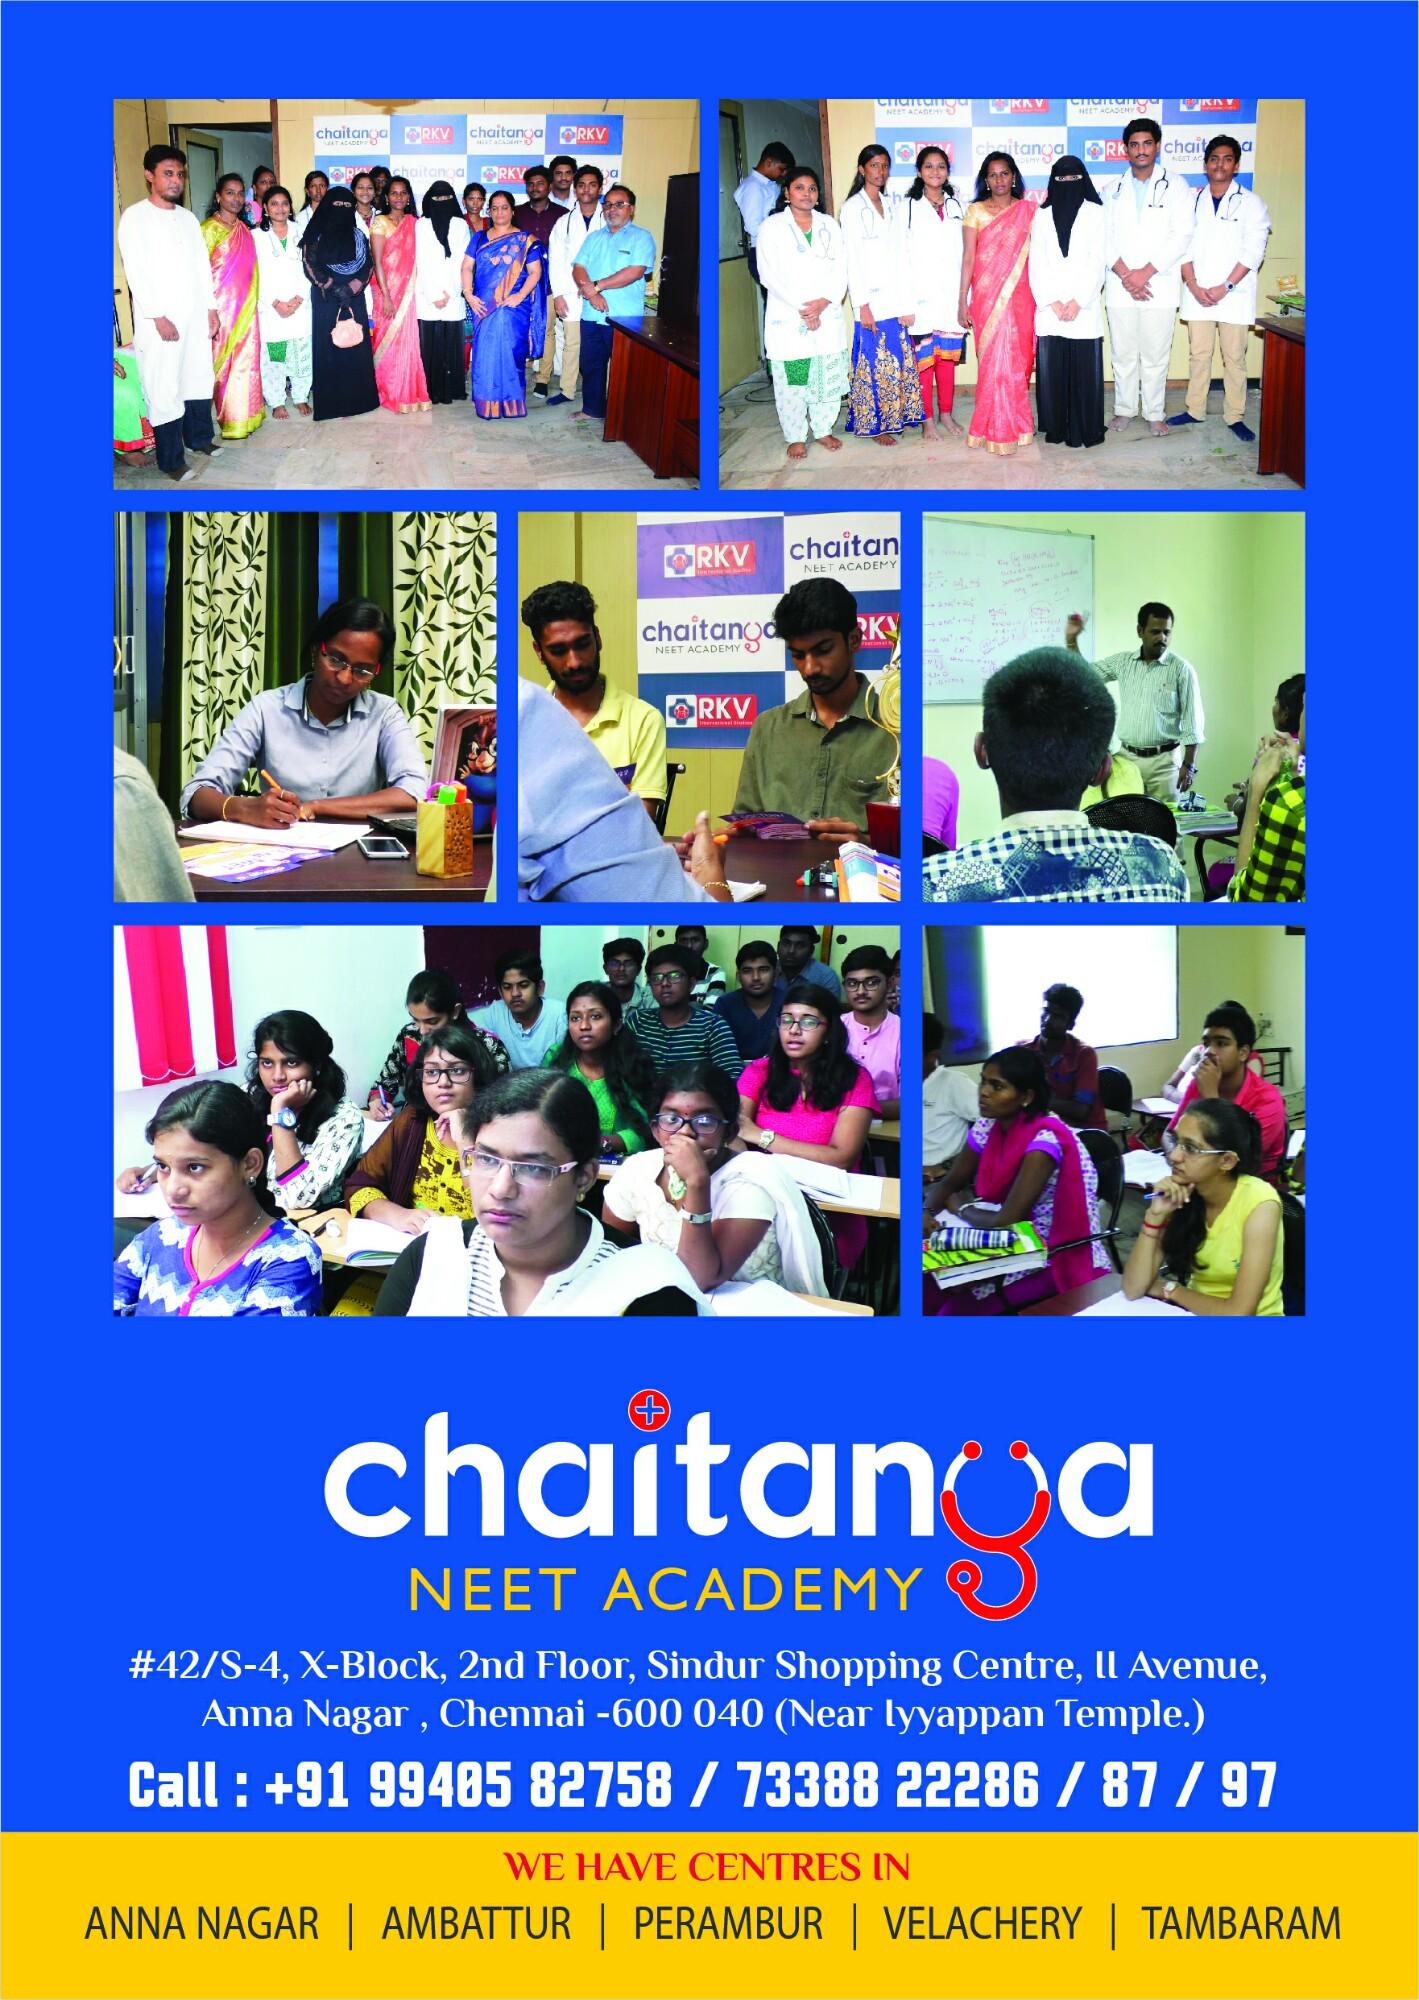 Chaitanya Neet Academy in Anna Nagar, Chennai-600040 | Sulekha